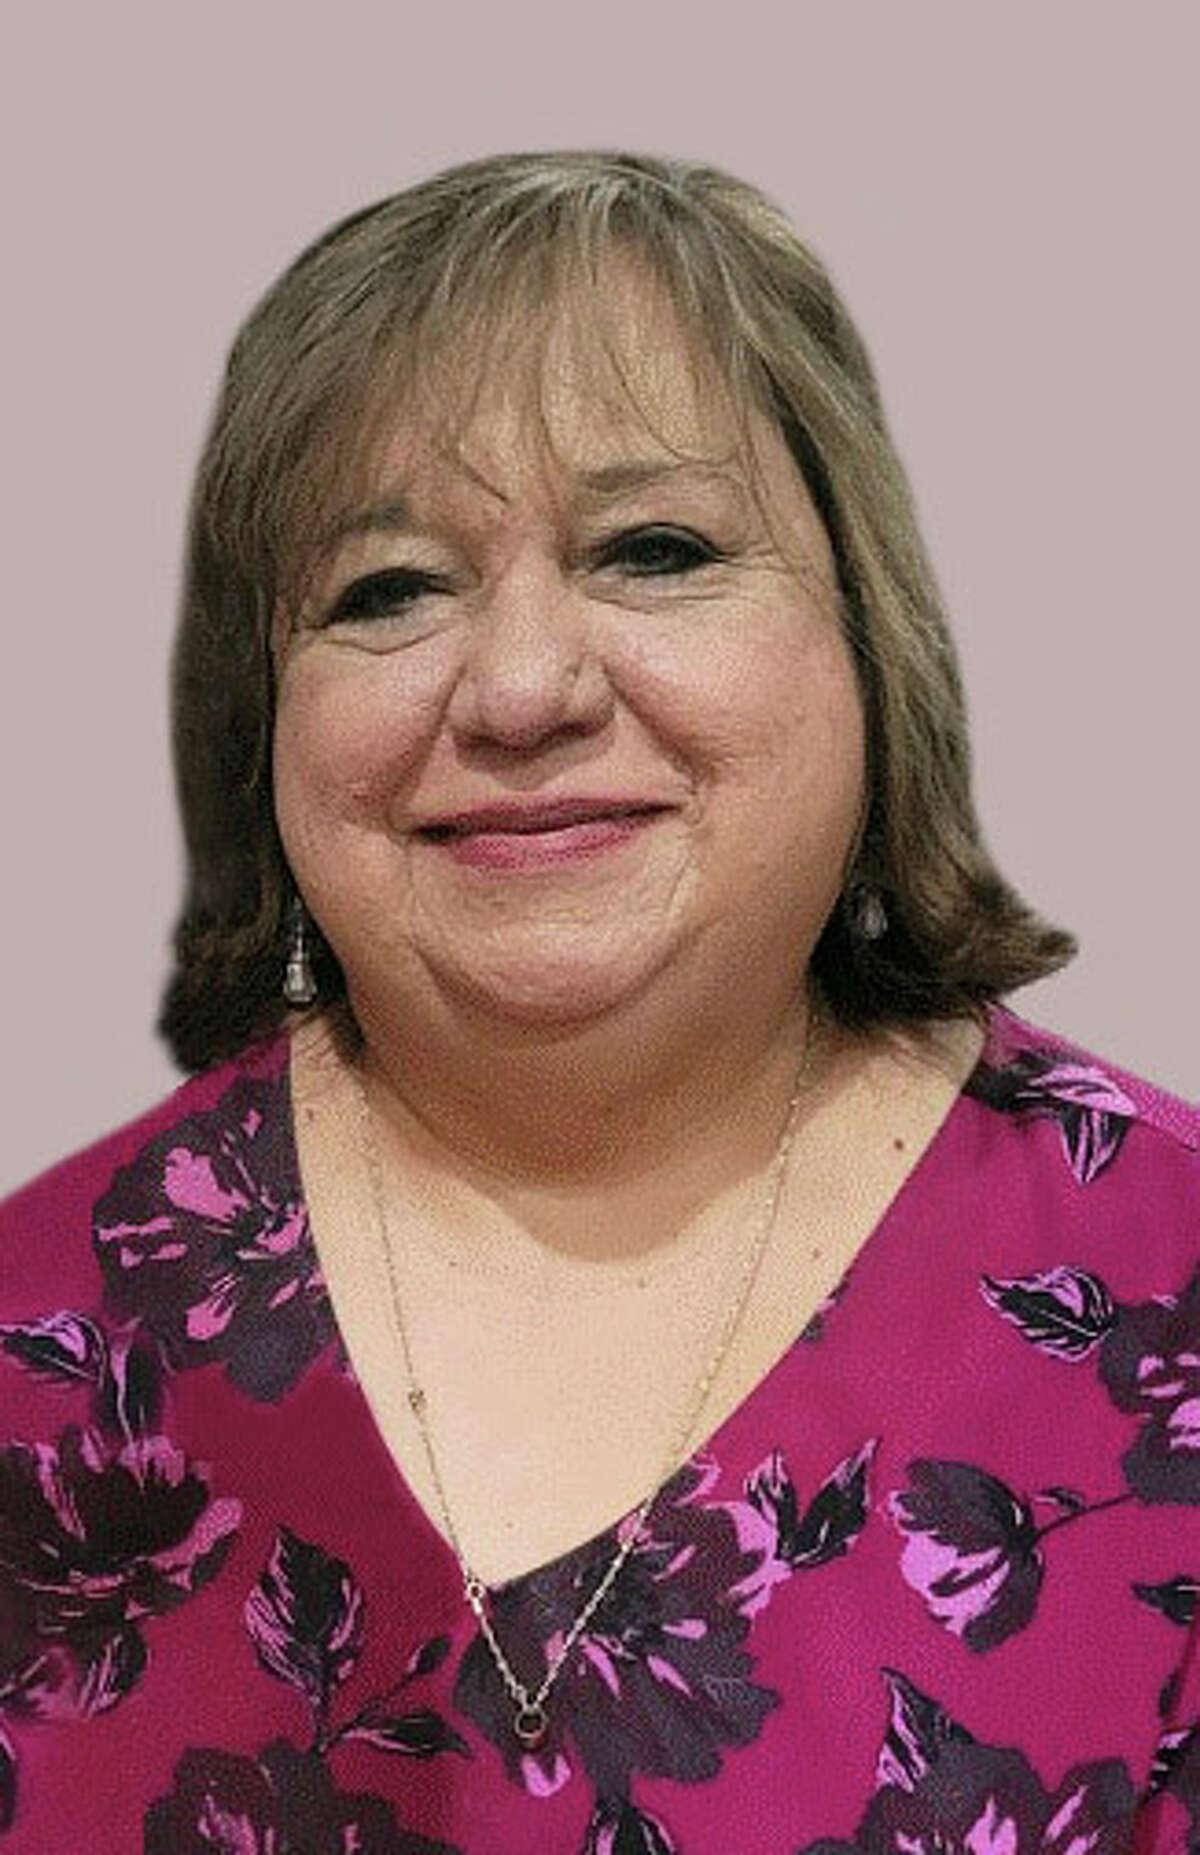 Leticia I. Rodríguez